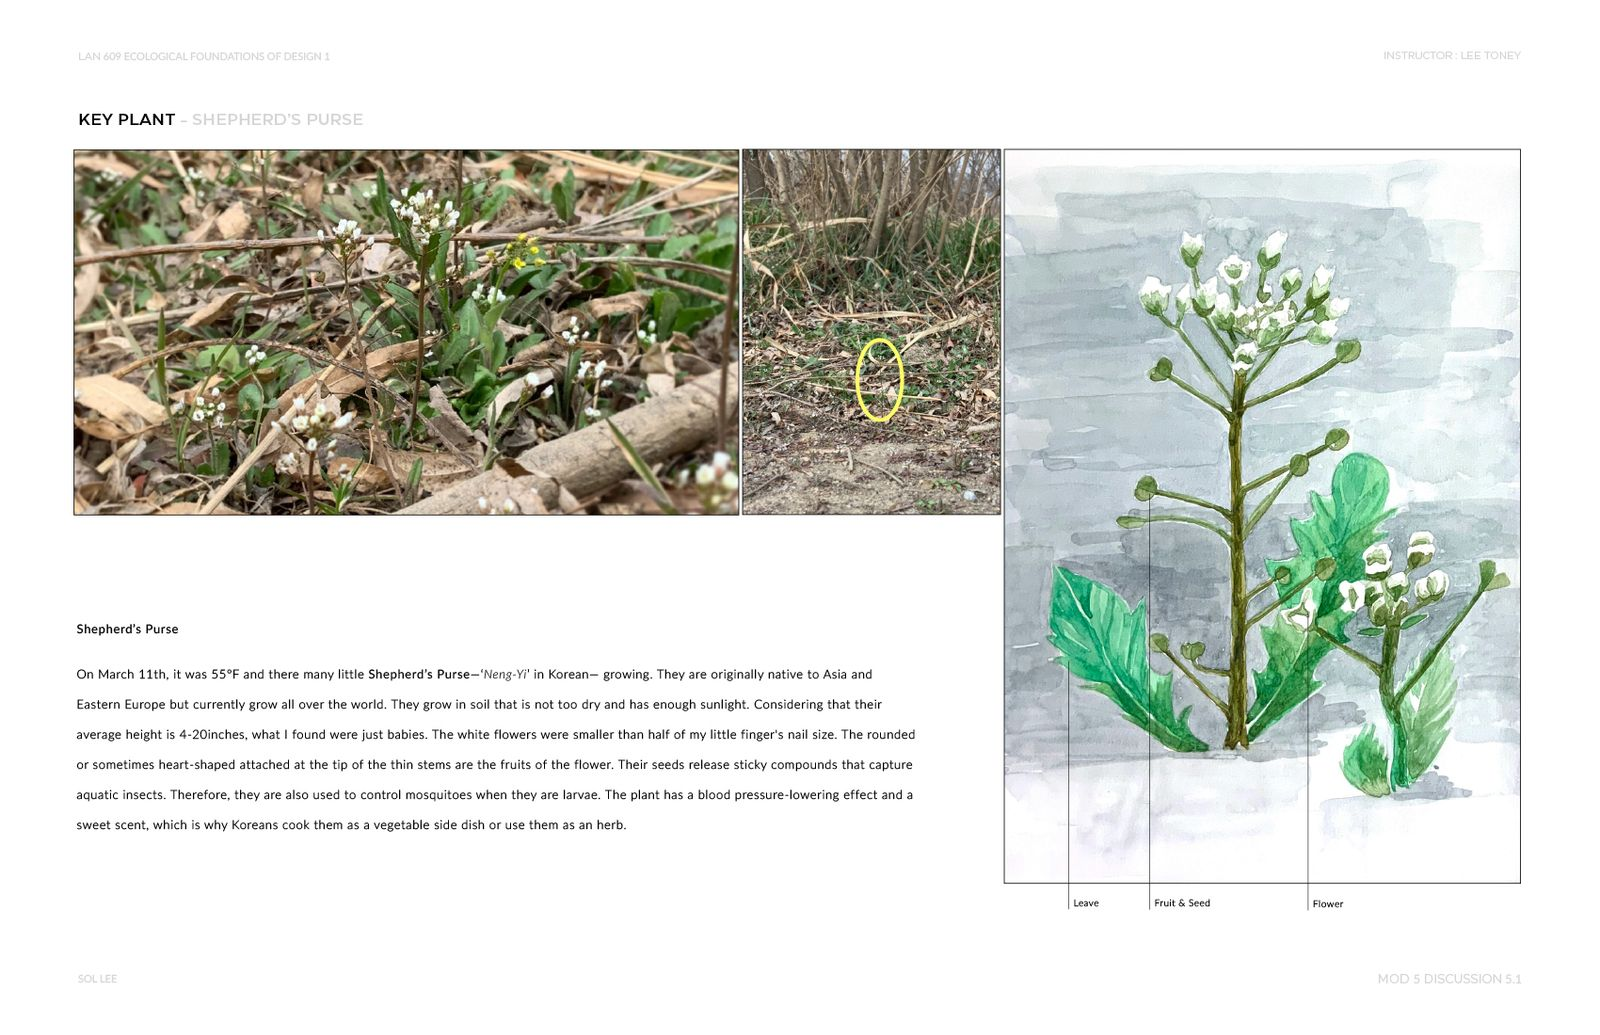 Gangseo Wet Ecology Park - Key Plant - Shepherd's Purse